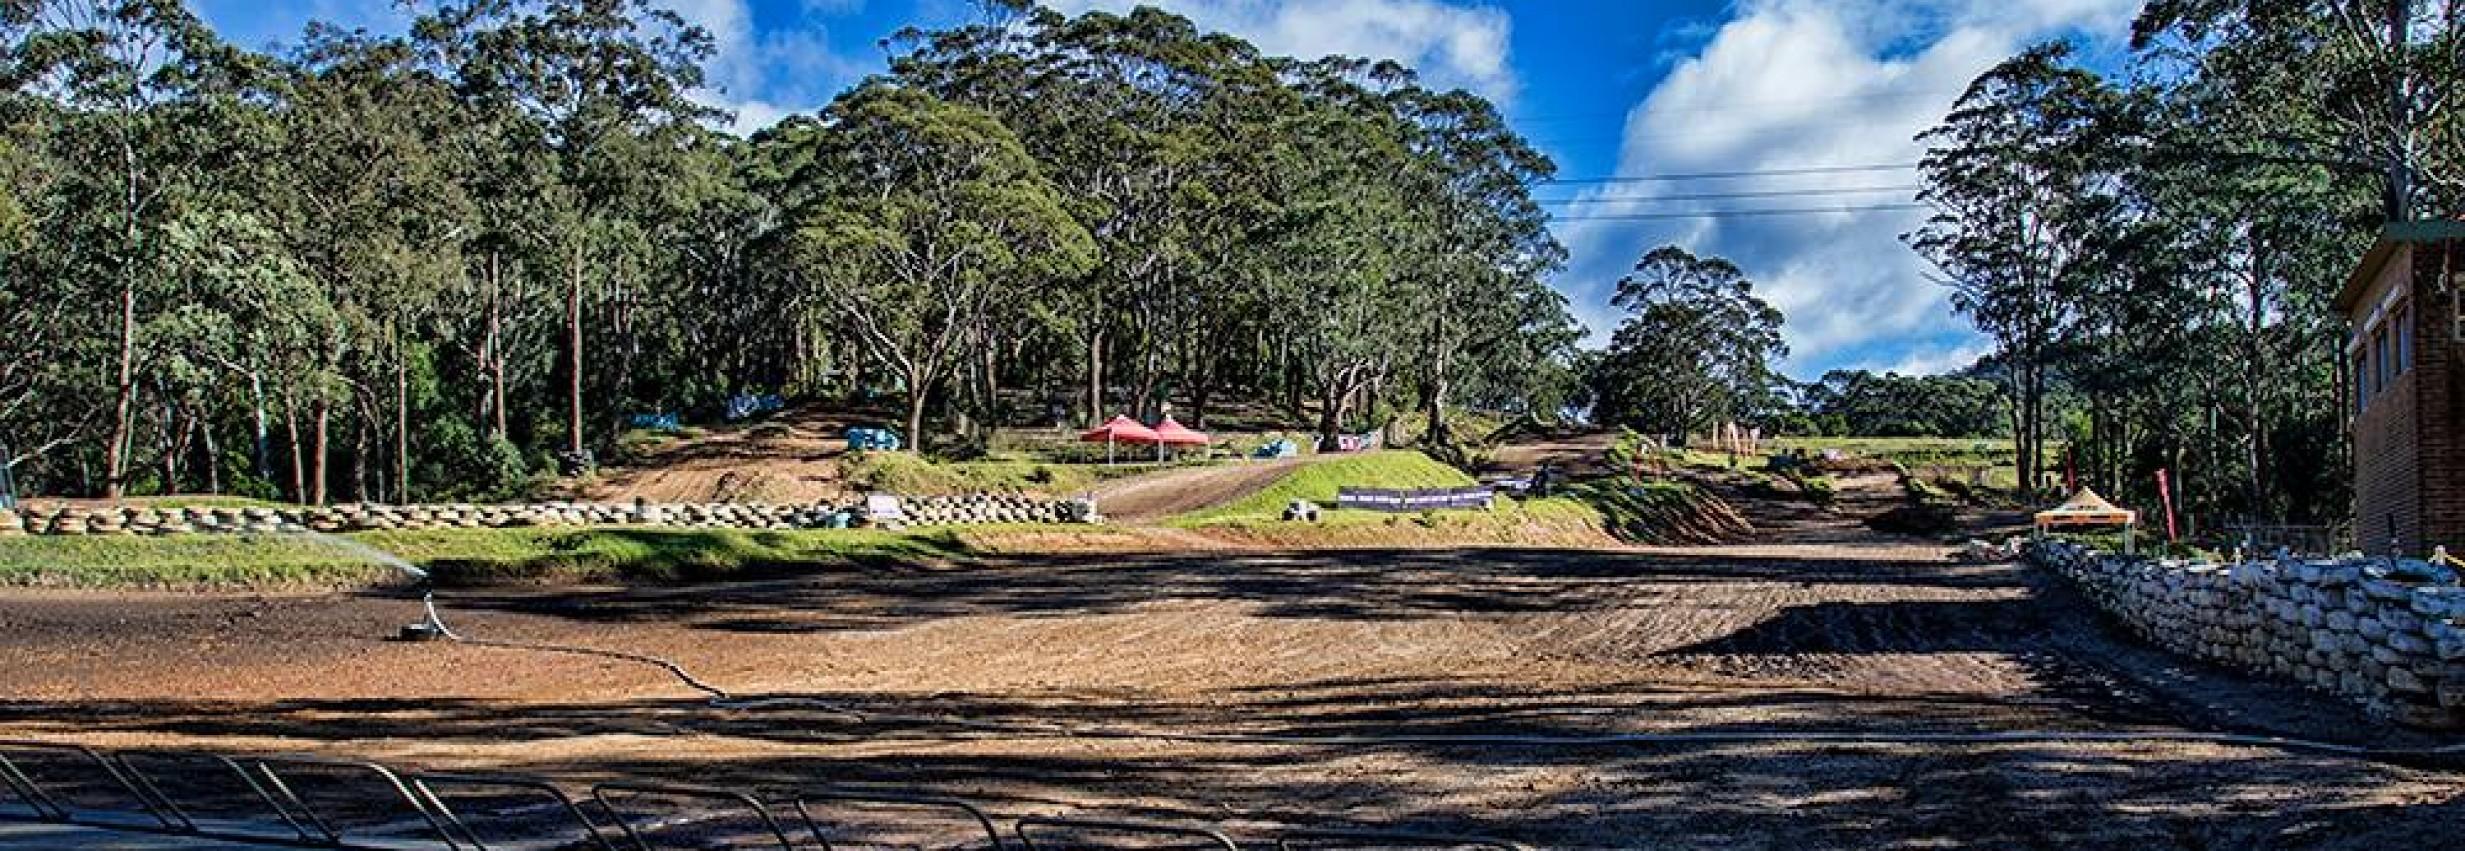 Mt Kembla Dirt Bike Complex – Wollongong Motocross